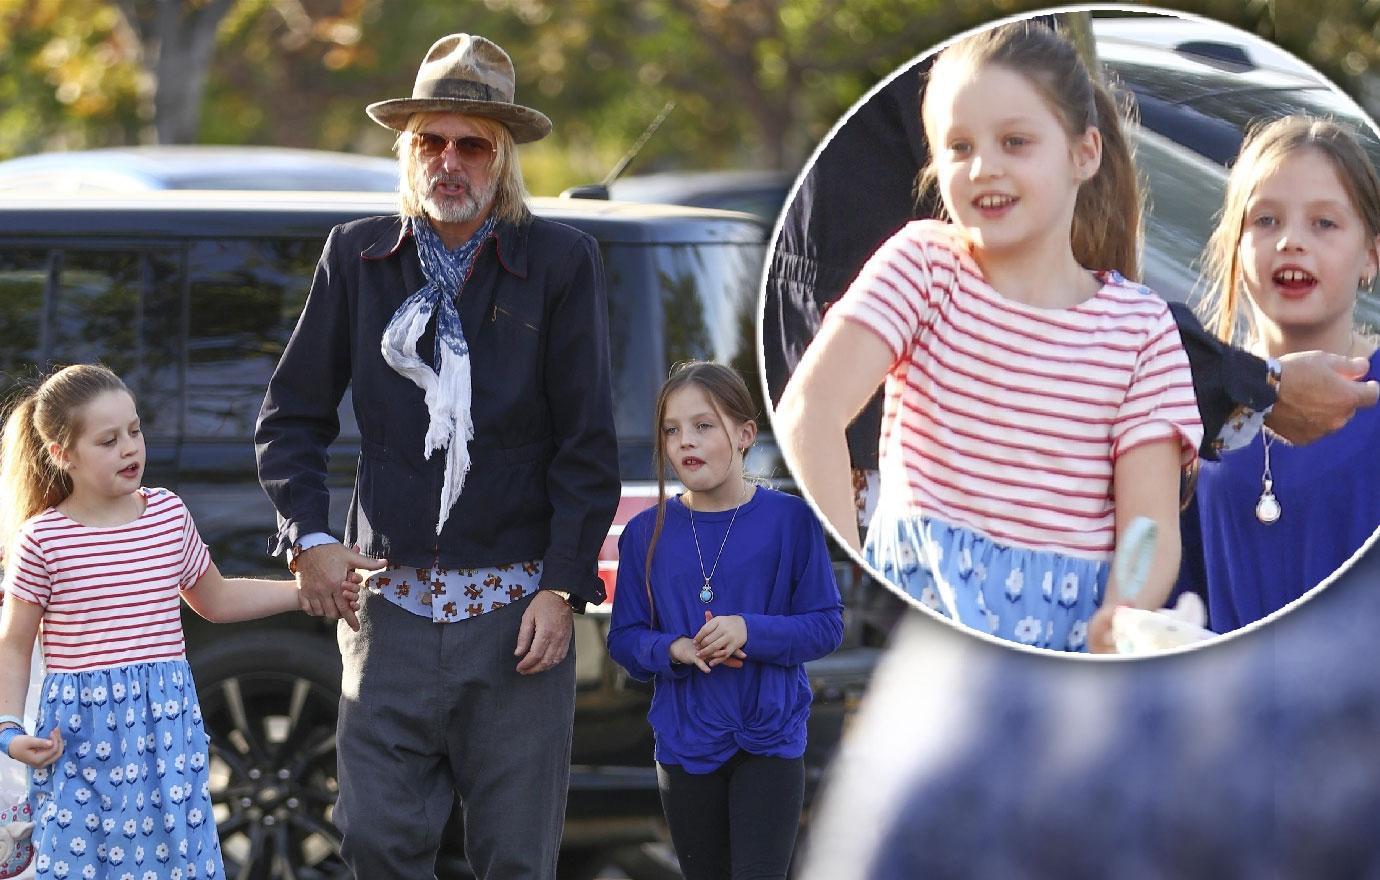 Lisa Marie Presley Ex Michael Lockwood With Kids Bitter Divorce